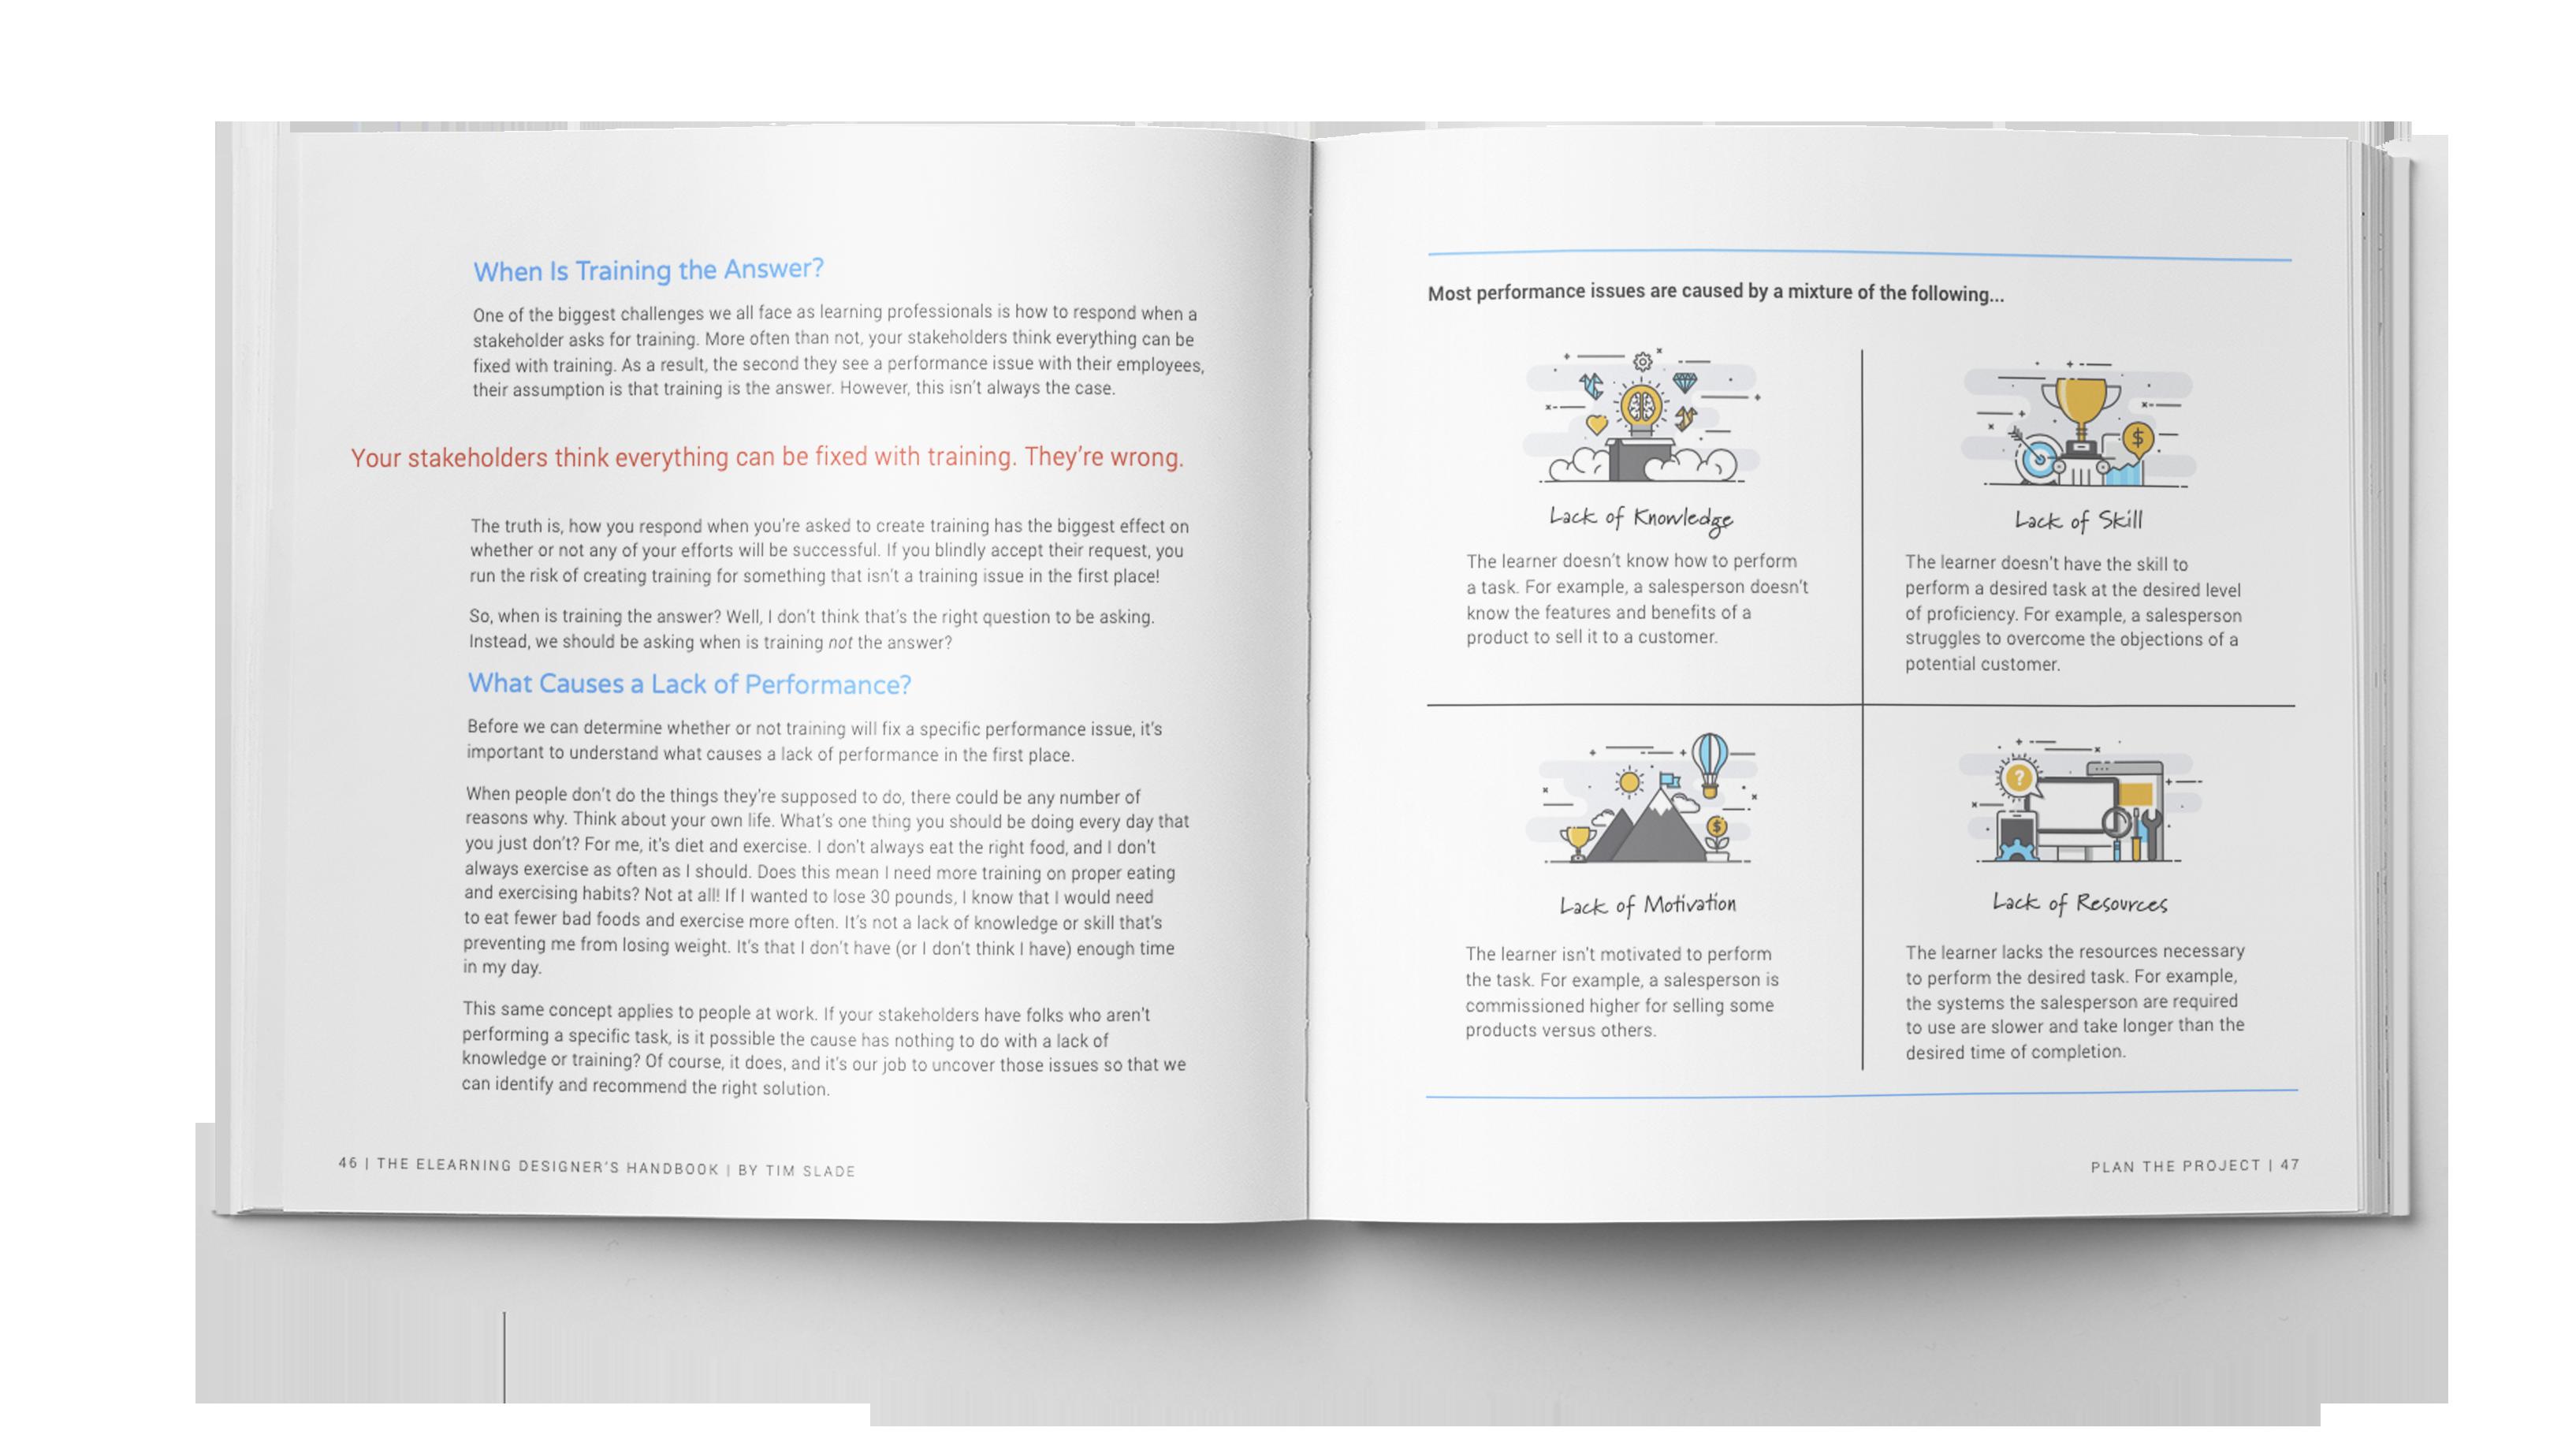 The eLearning Designer's Handbook by Tim Slade | Plan the Project | Freelance eLearning Designer | The eLearning Designer's Academy